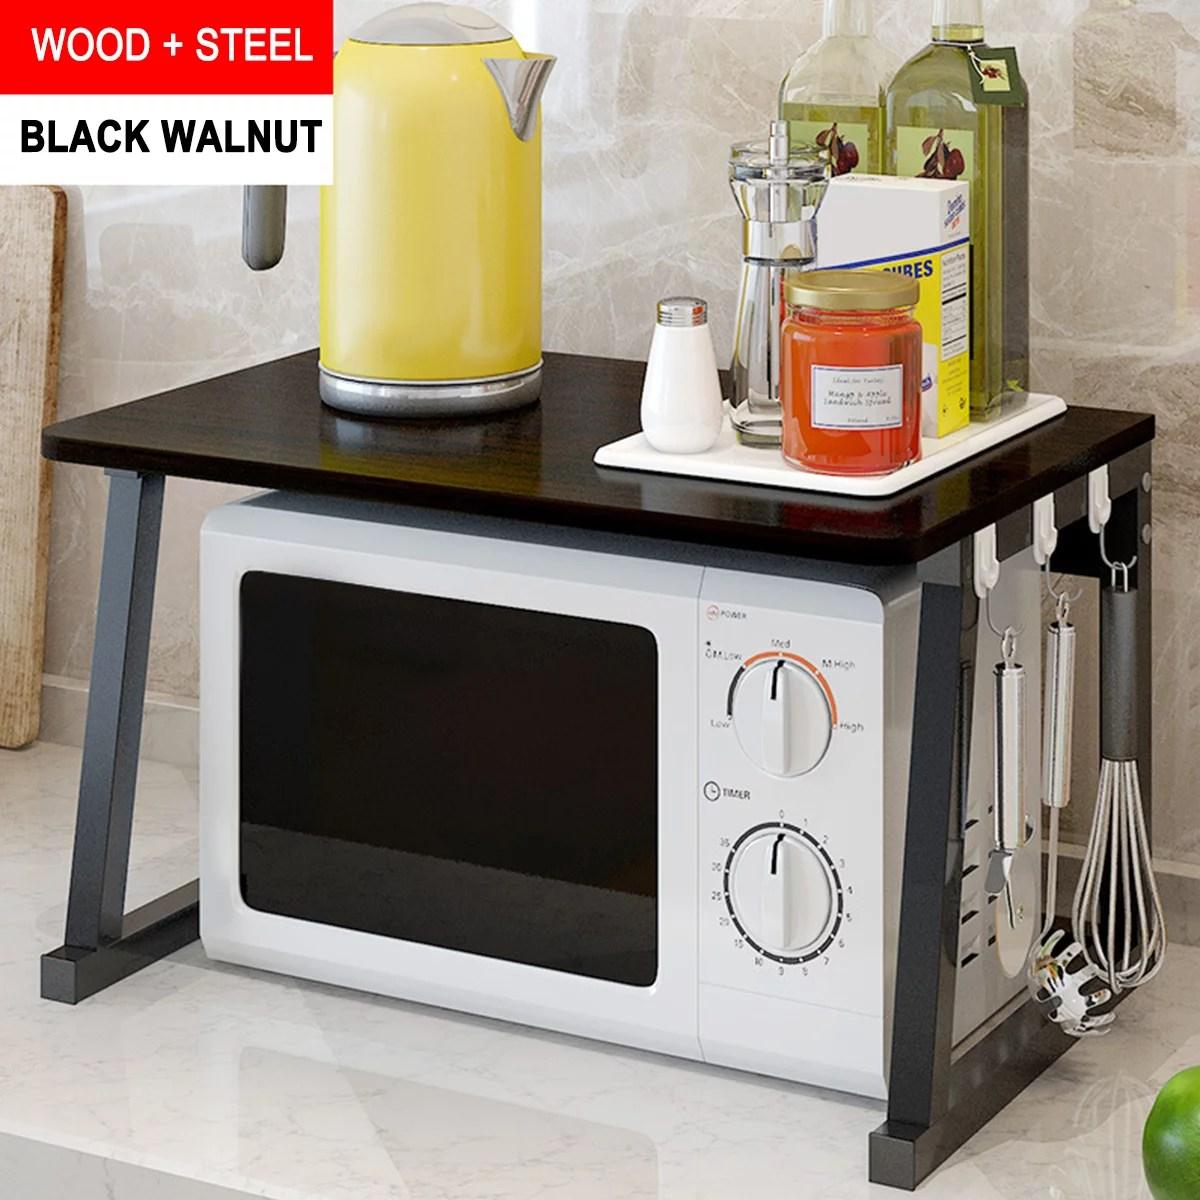 us kitchen shelf microwave oven rack stand wooden condiment storage cabinet